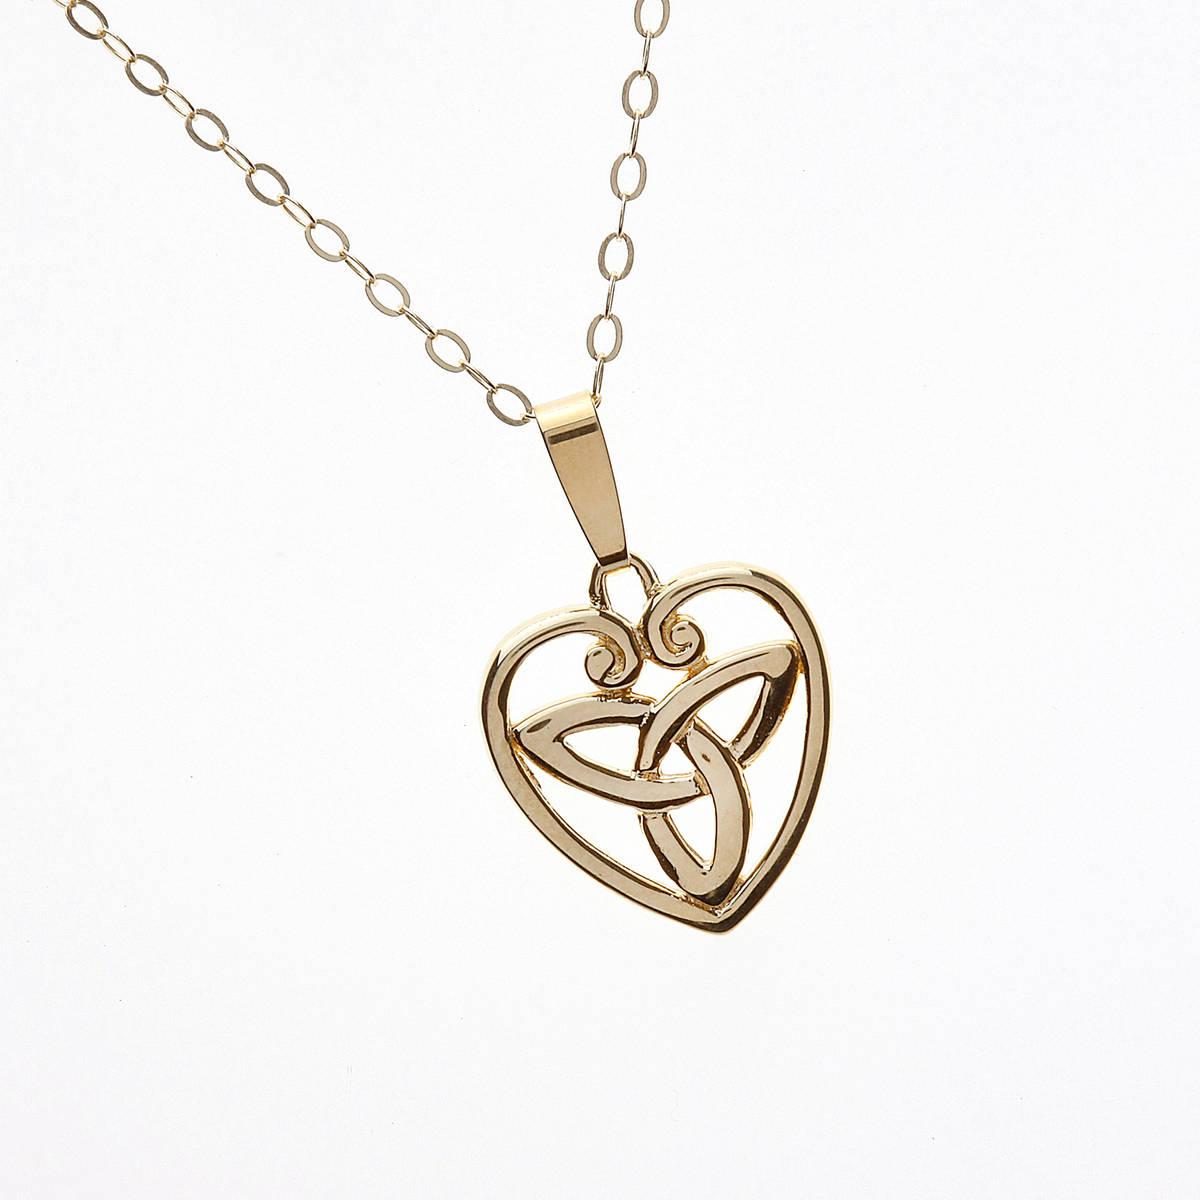 10 carat yellow gold trinity knot pendant